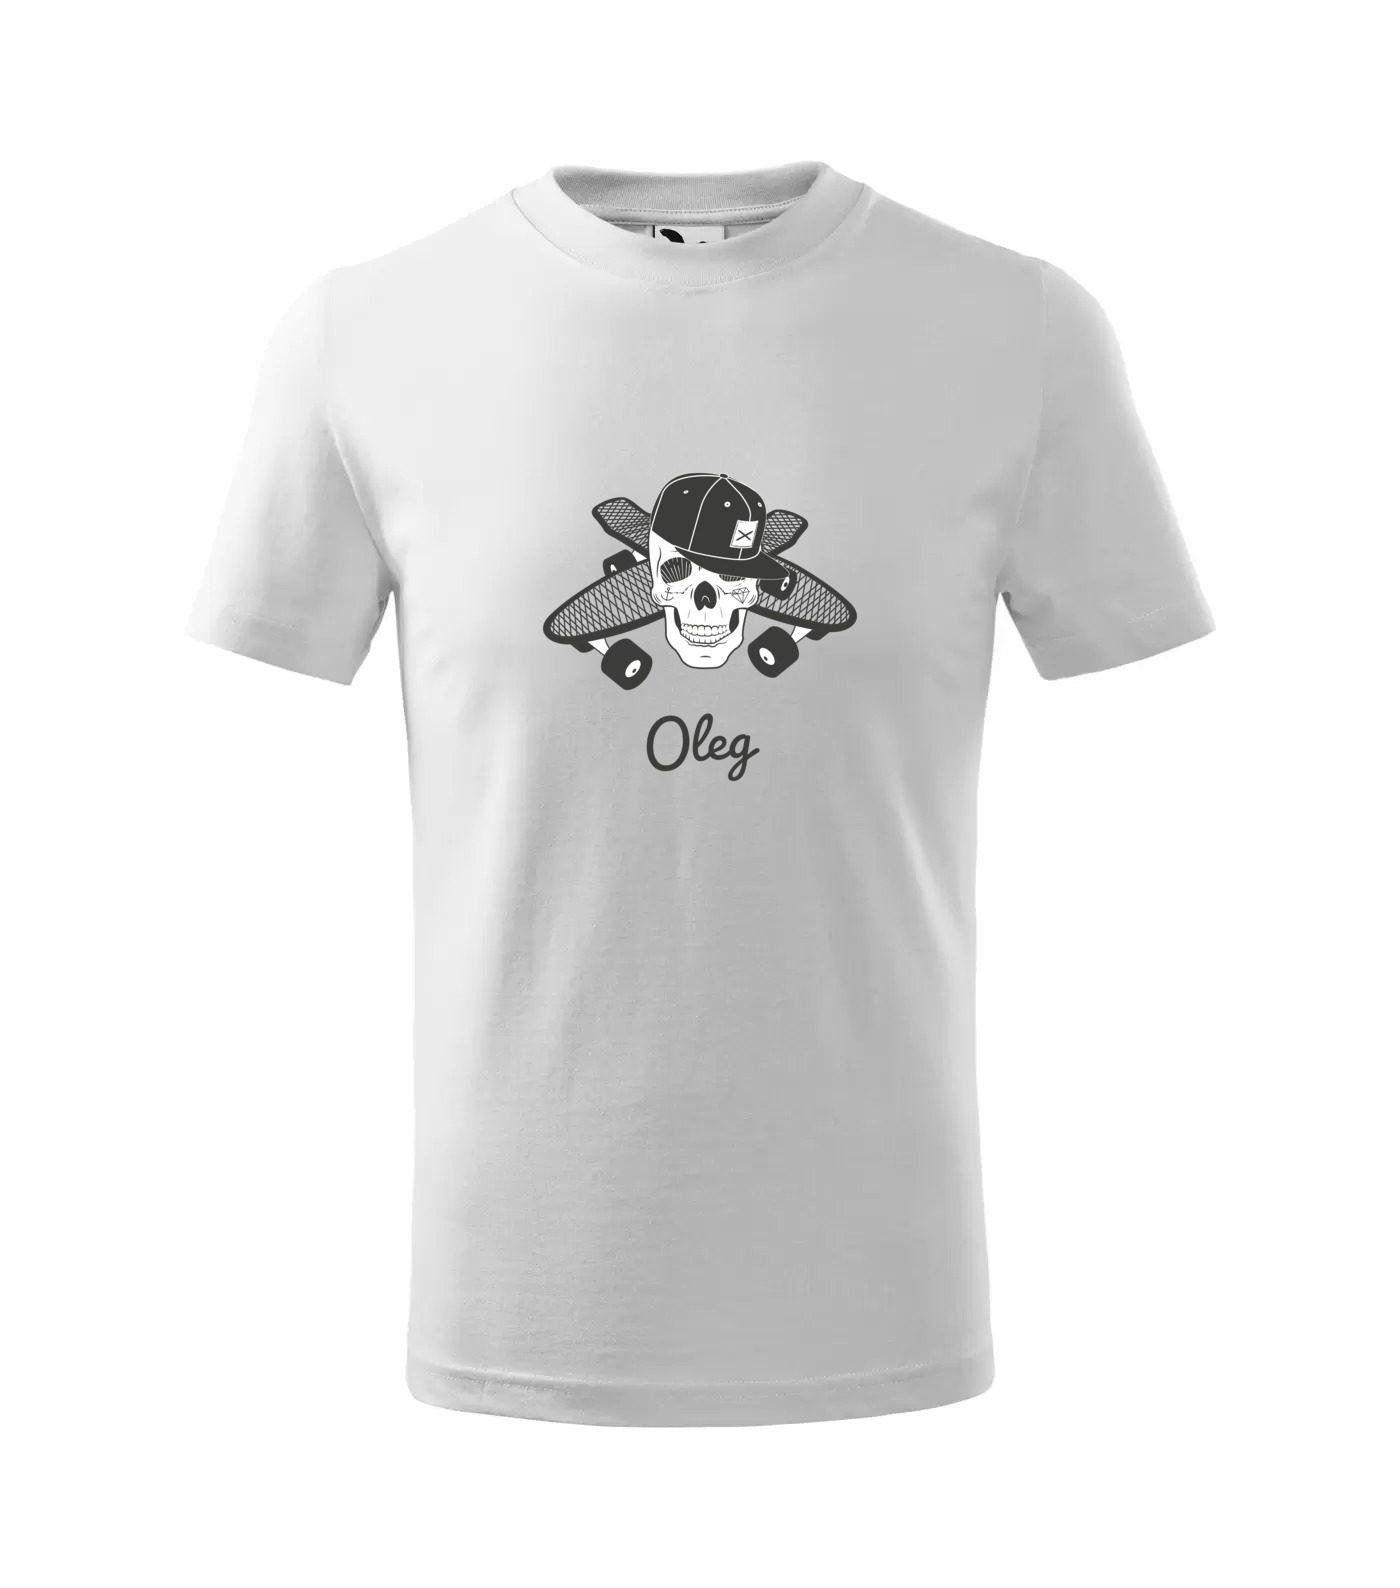 Tričko Skejťák Oleg